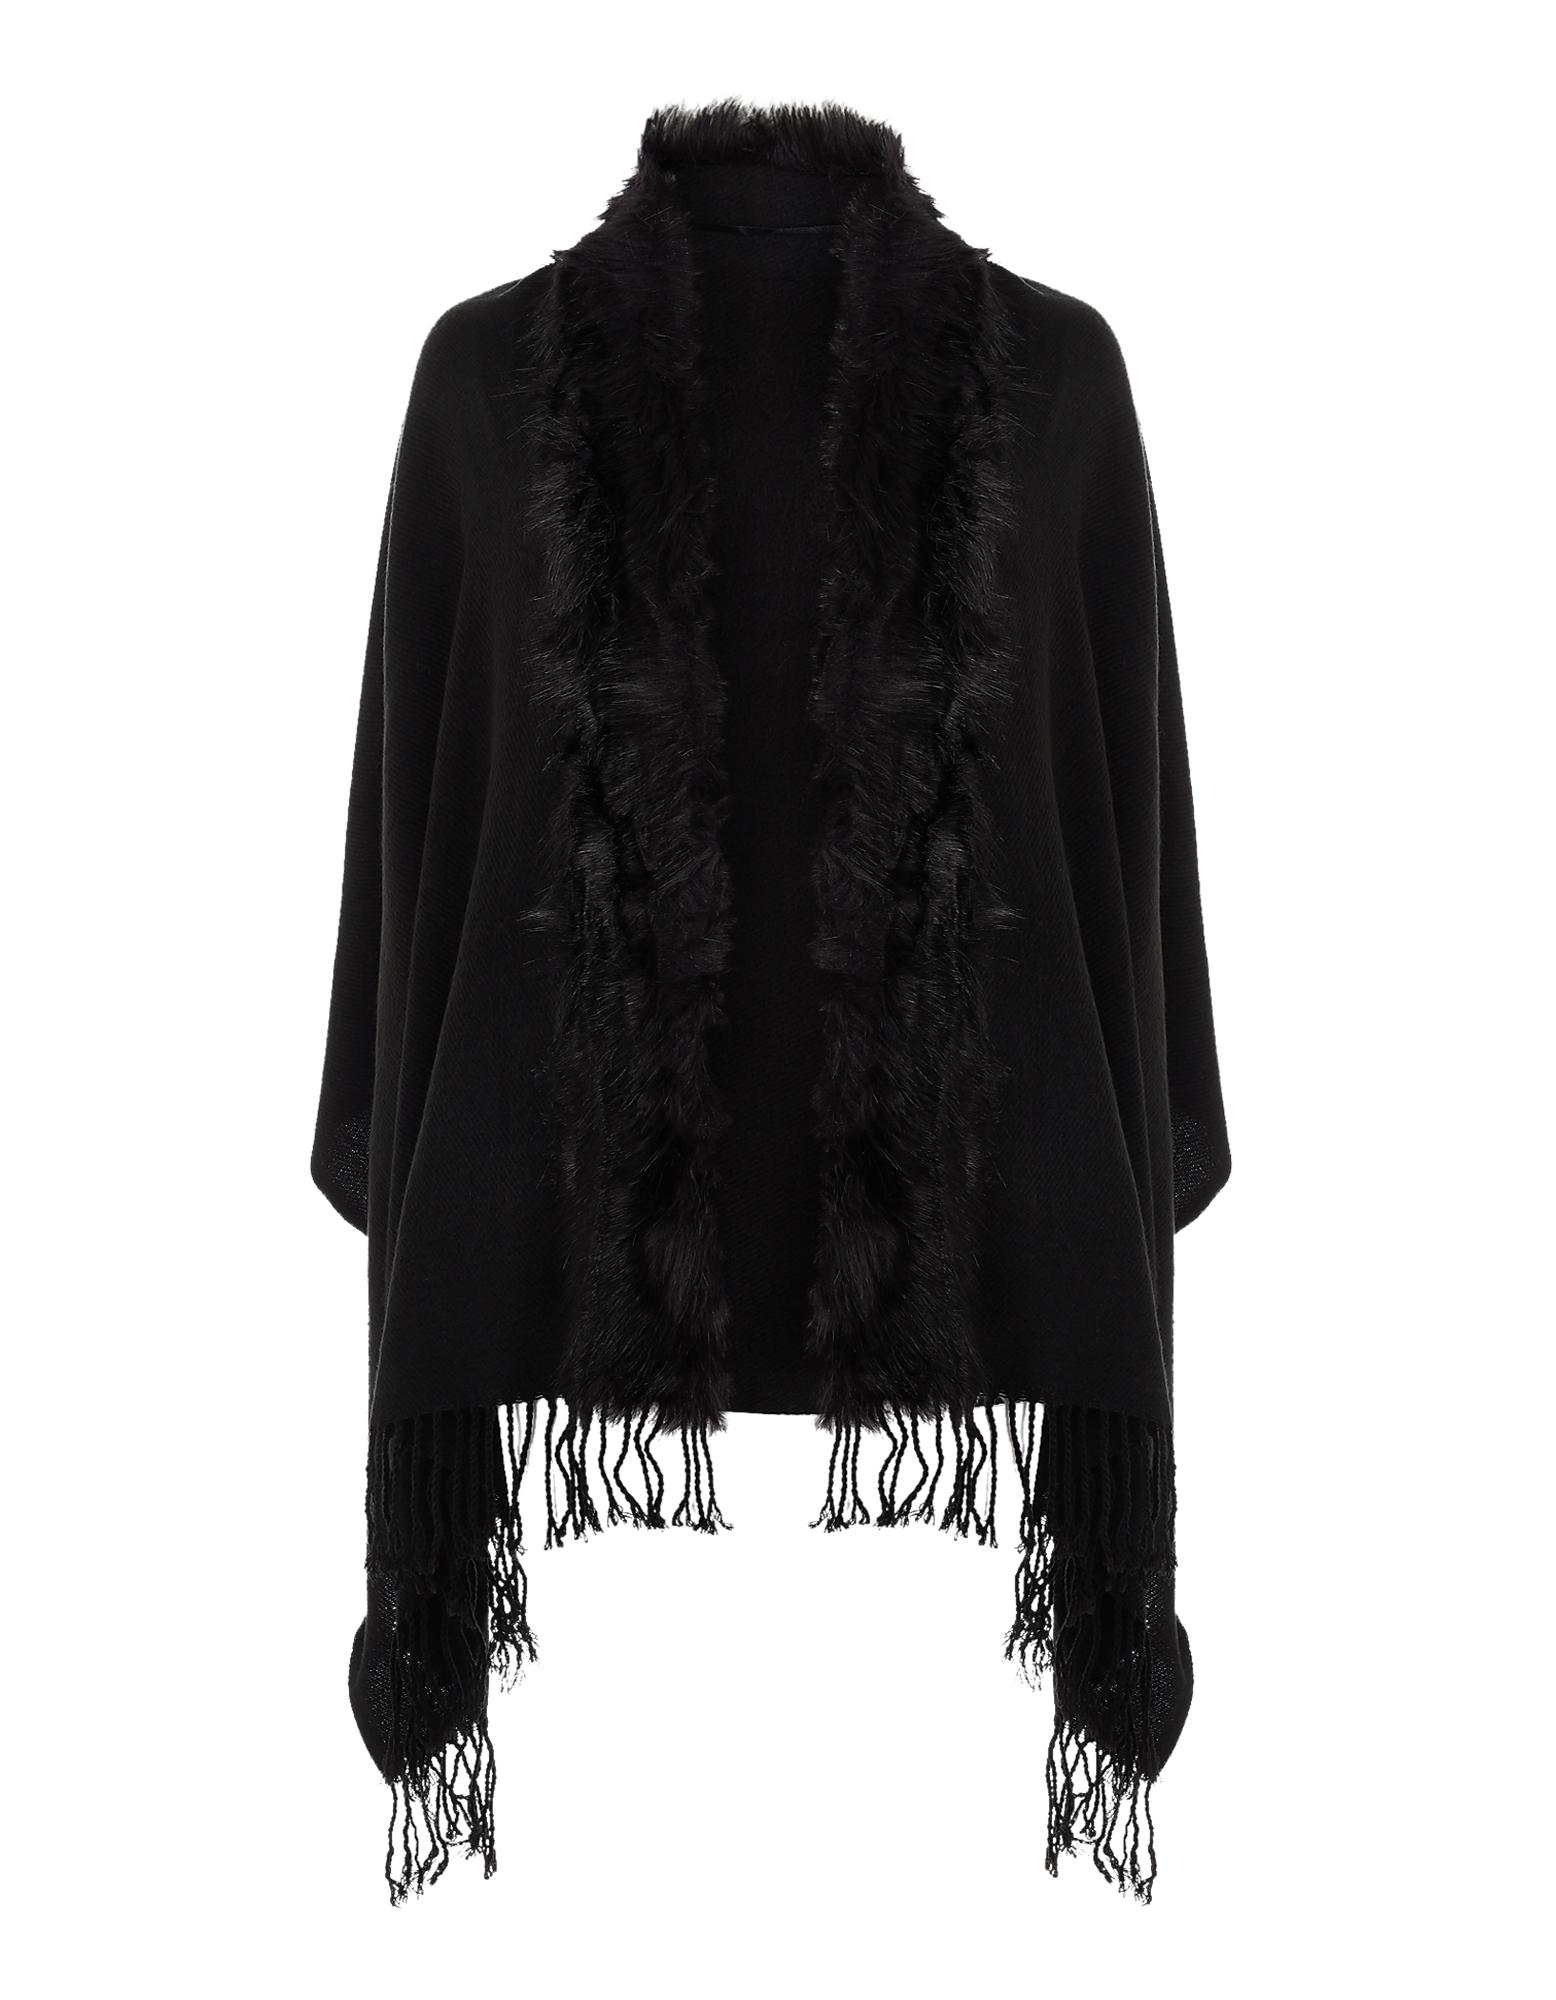 72ba4012733e8e takko-fashion Ponchos & Capes für Damen online kaufen | Damenmode ...